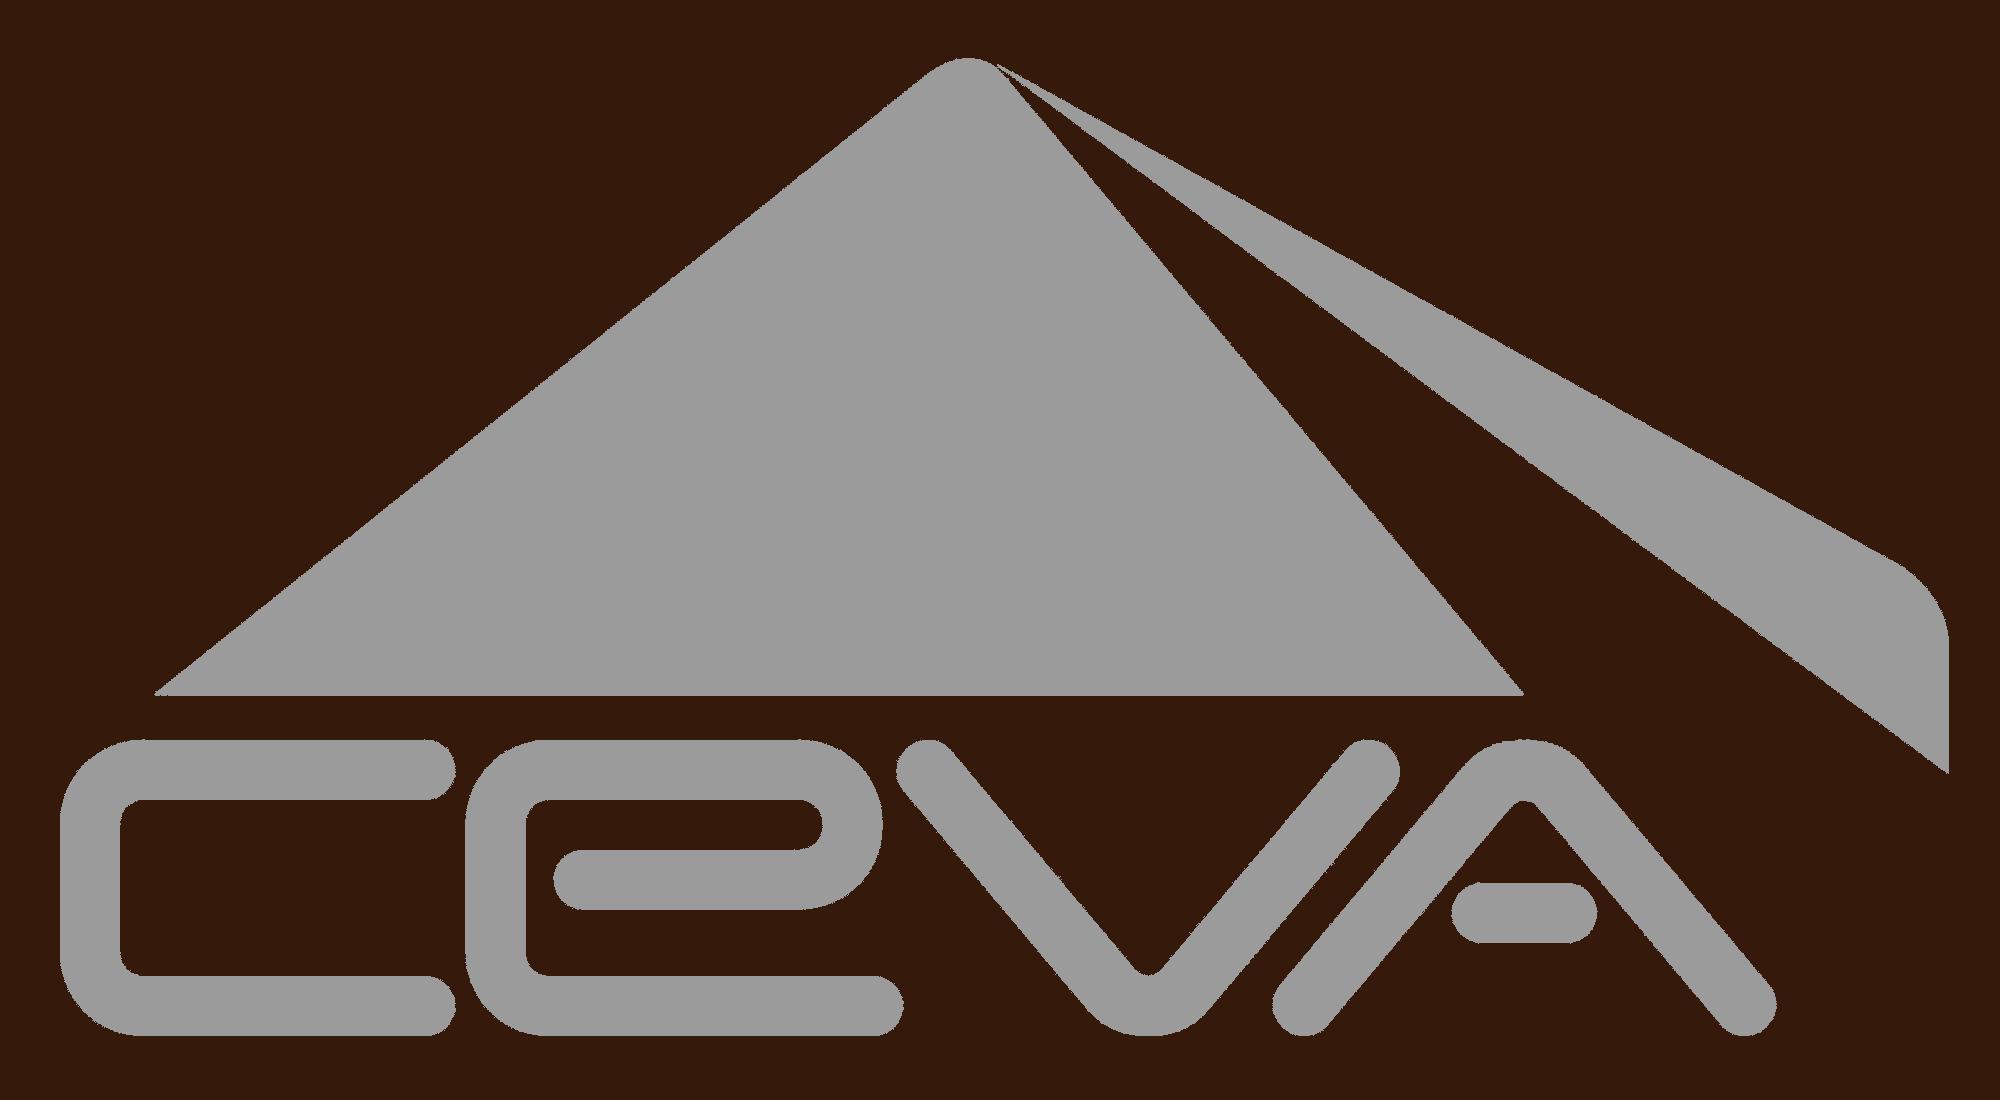 CEVA Logo in Grey